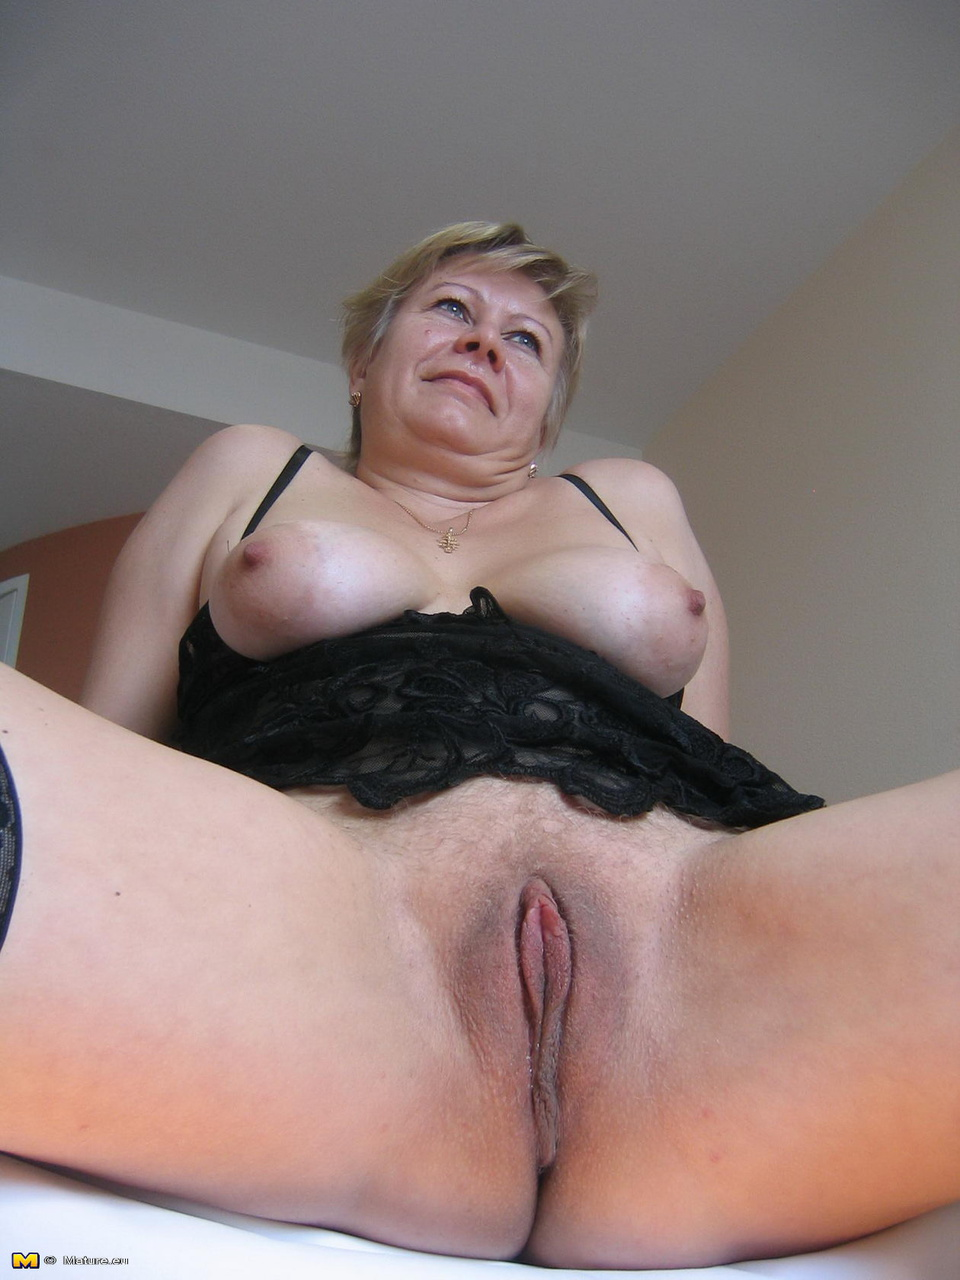 Фото зрелие женщини і пизди